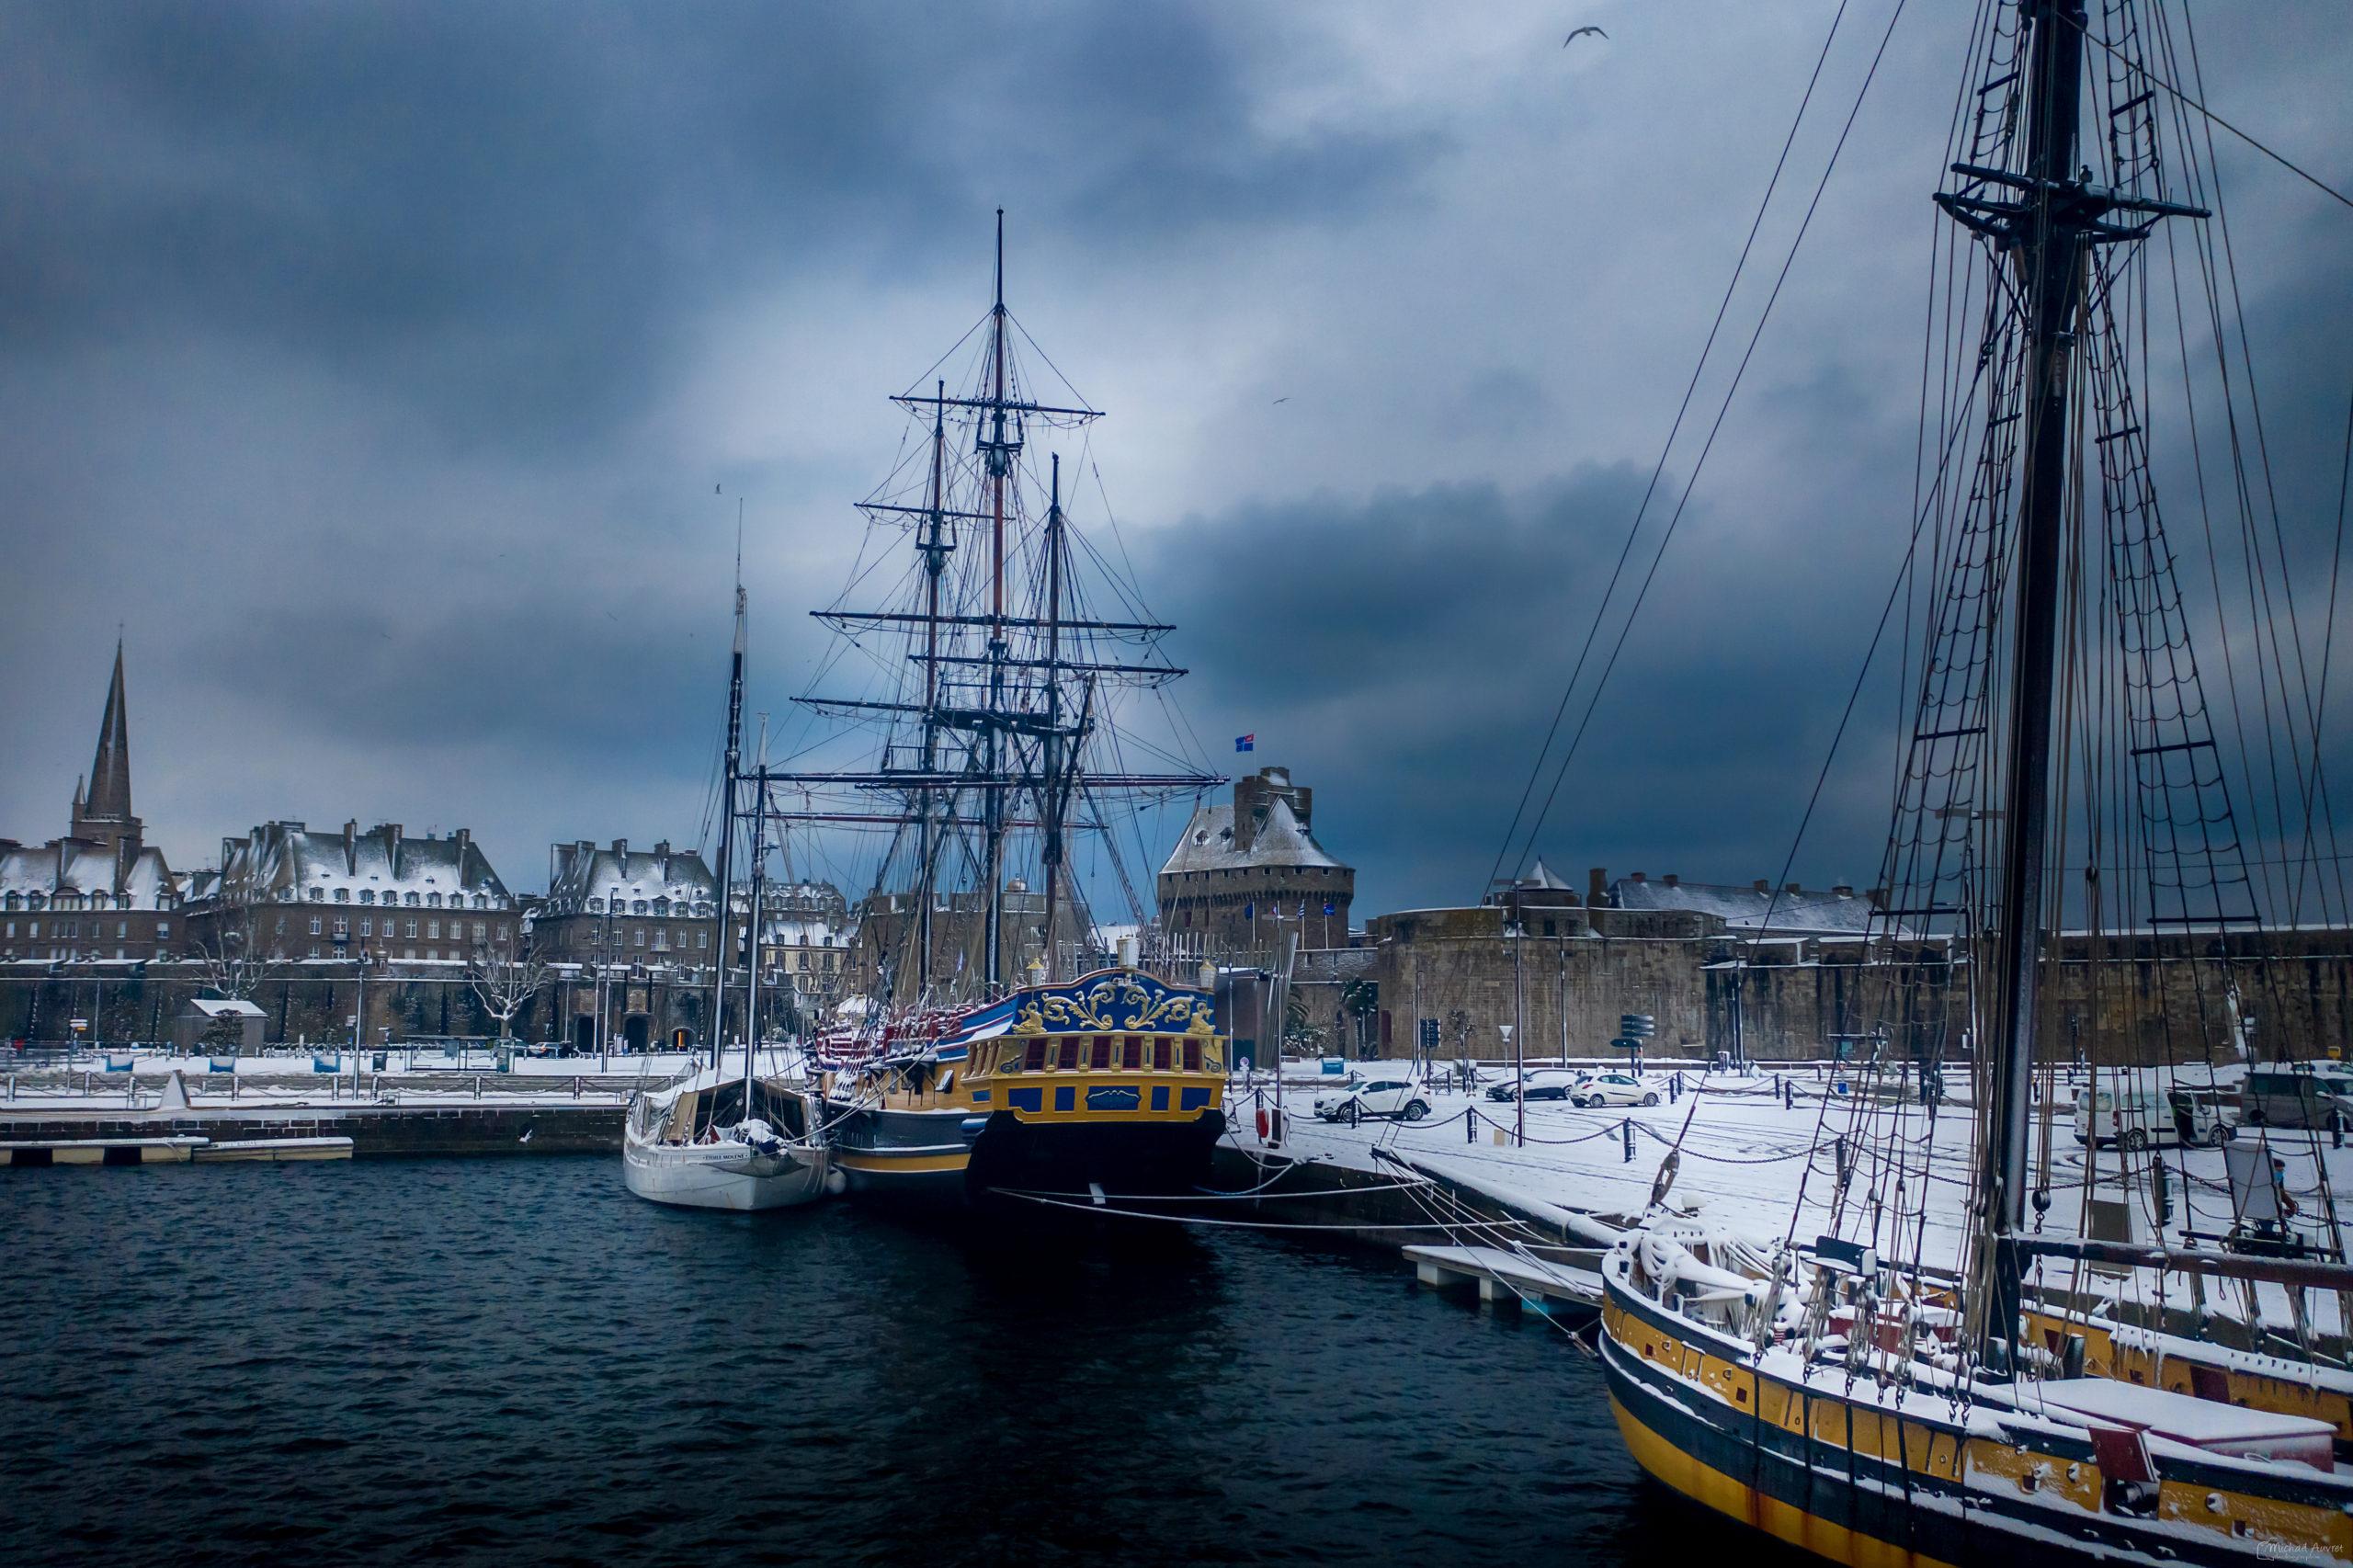 saint malo neige intra bateau corsaire